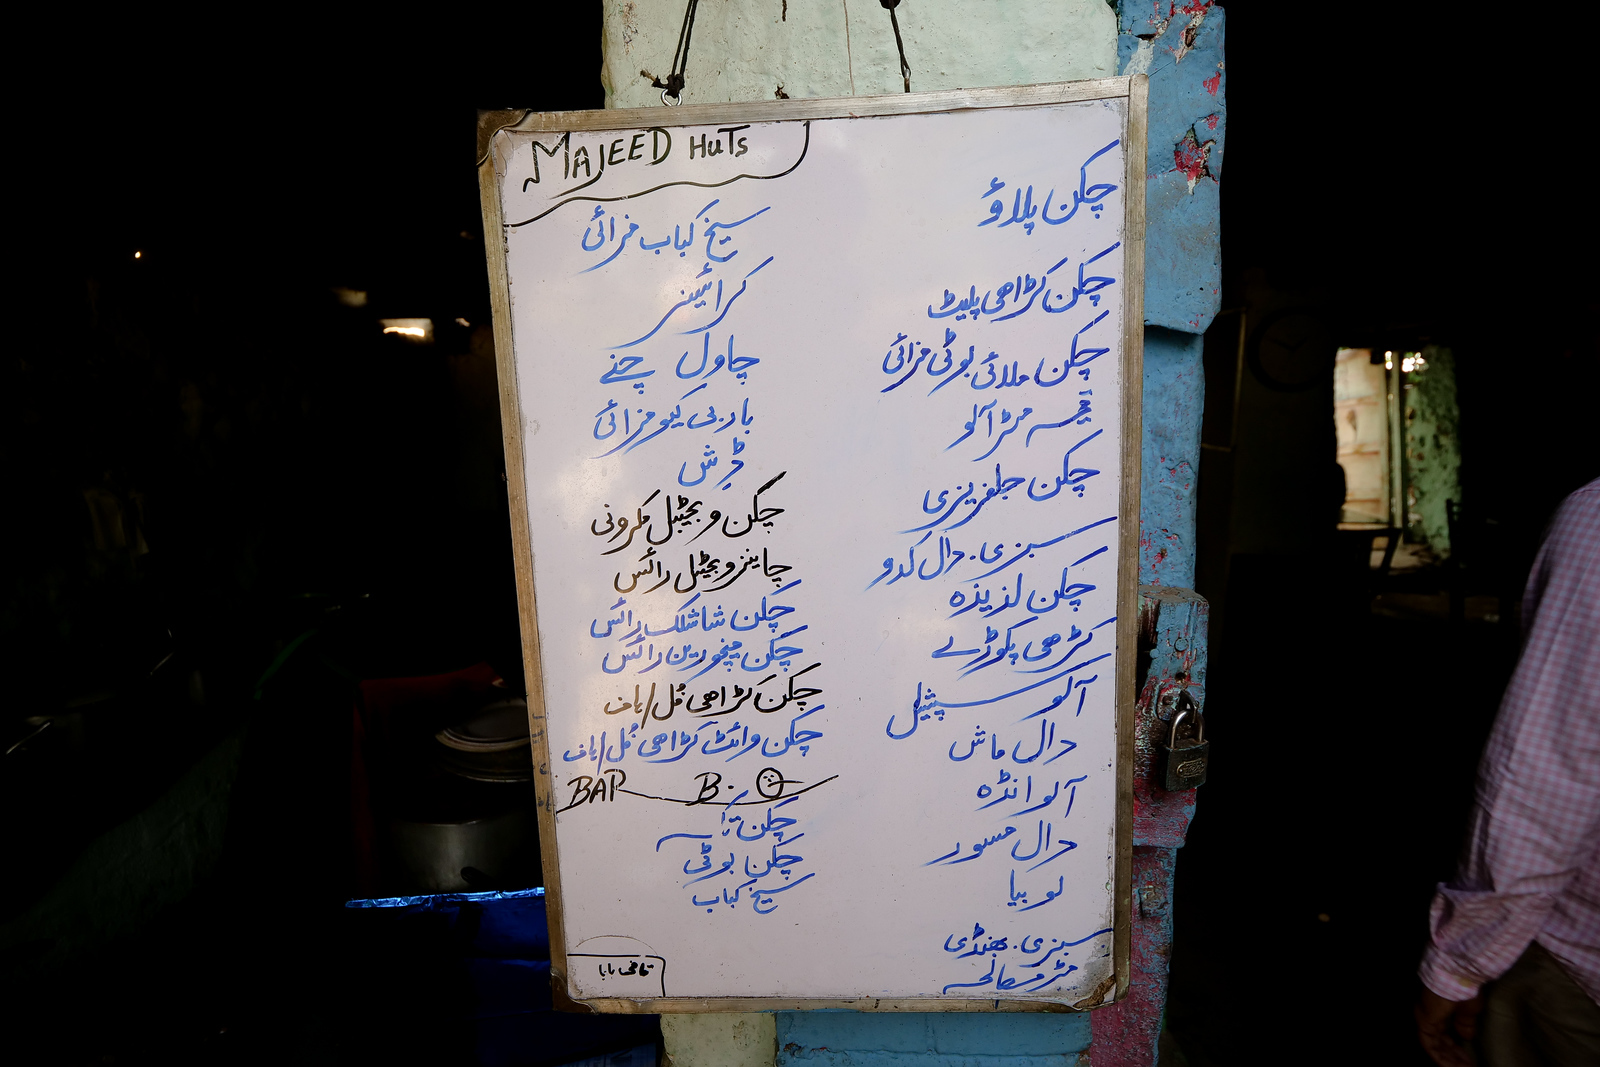 Majeed Huts in Islamabad